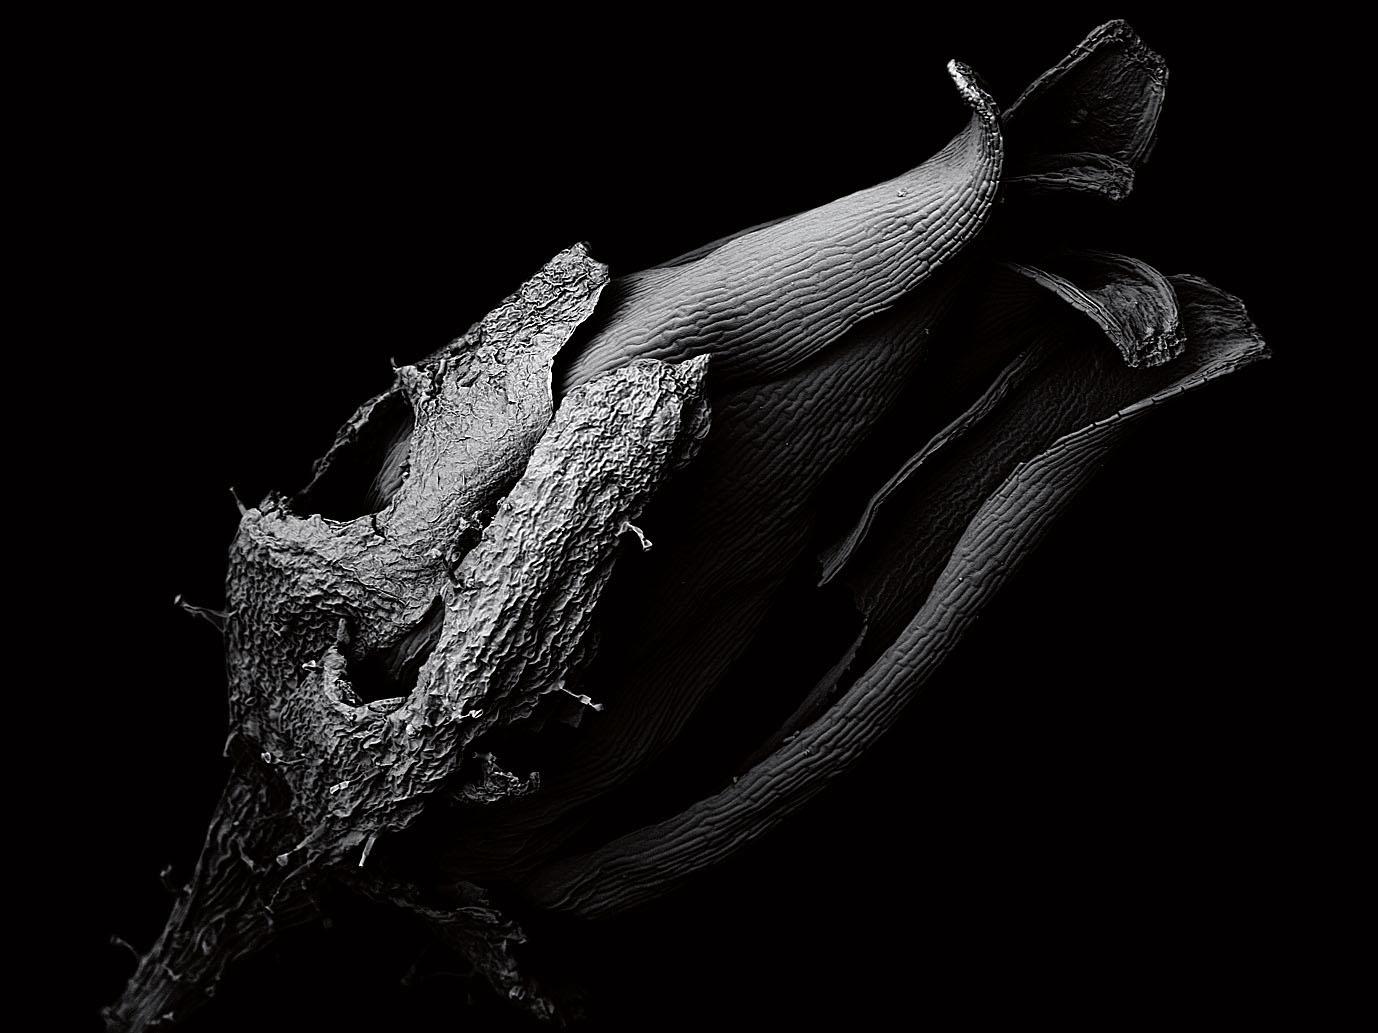 Tomoya Matsuura写真展「life beside you」